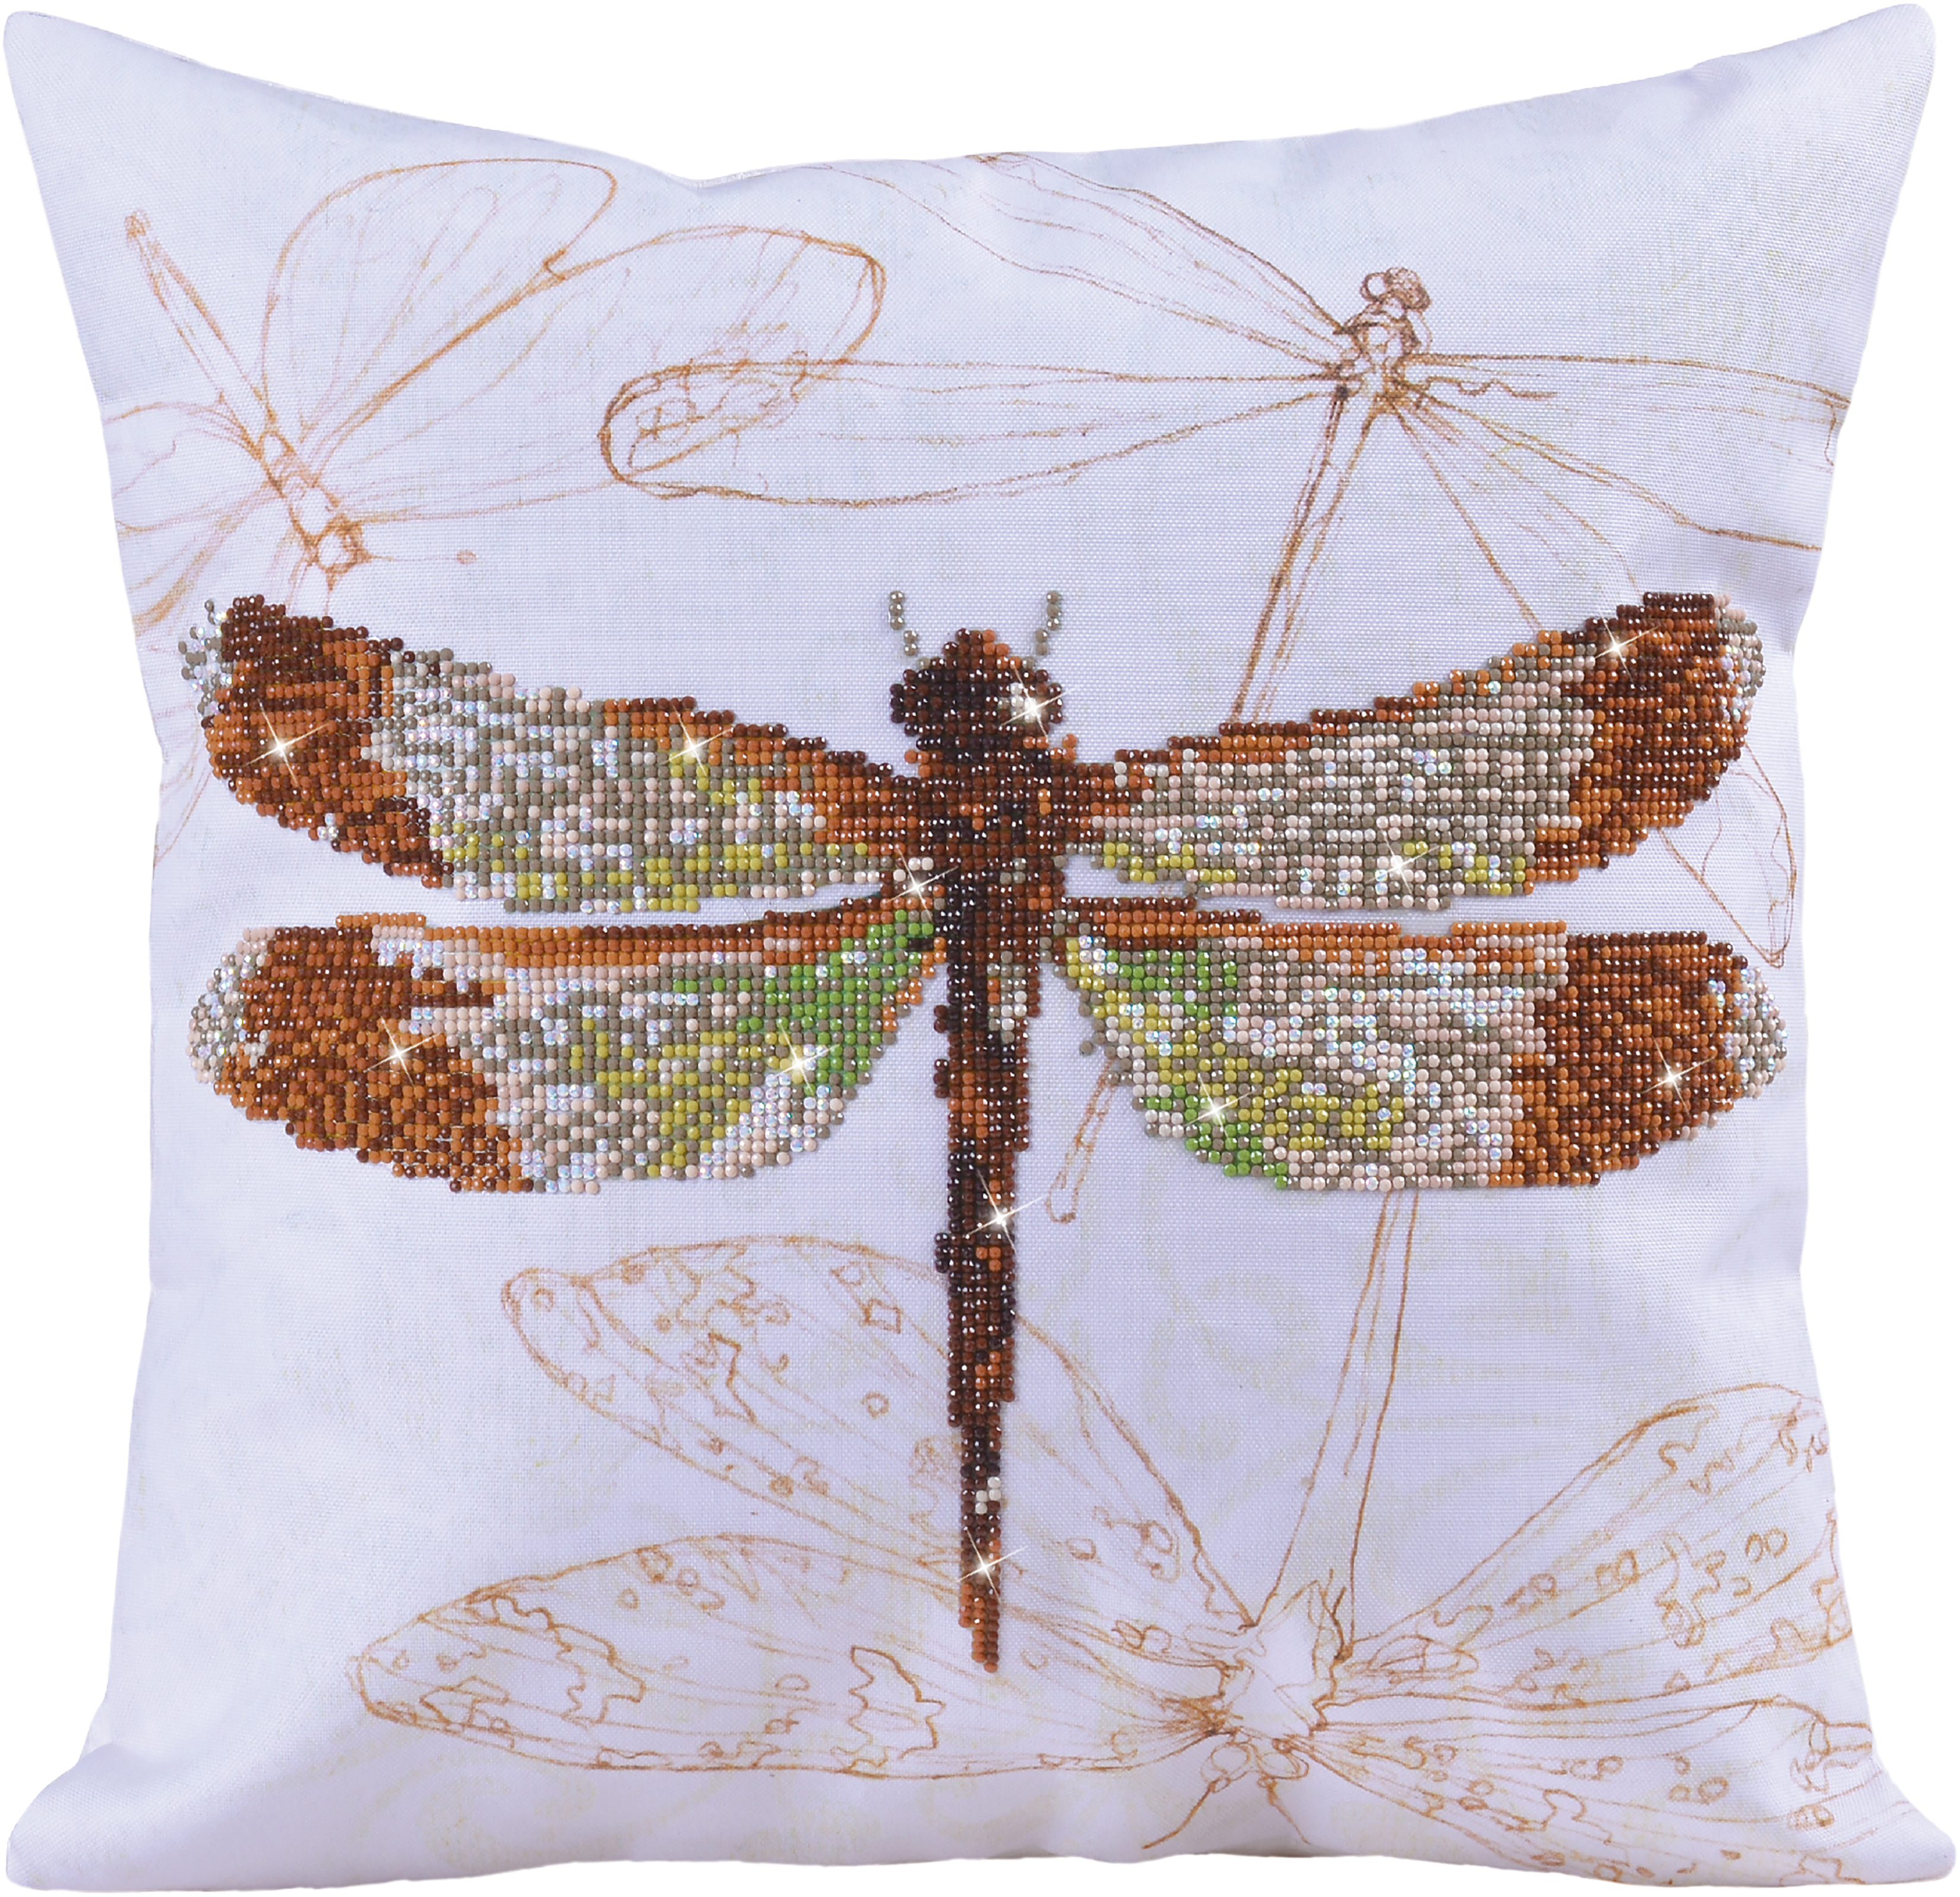 Diamond Dotz Diamond Embroidery Pillow Facet Art Kit-Dragonfly Earth (17.5X17.5)